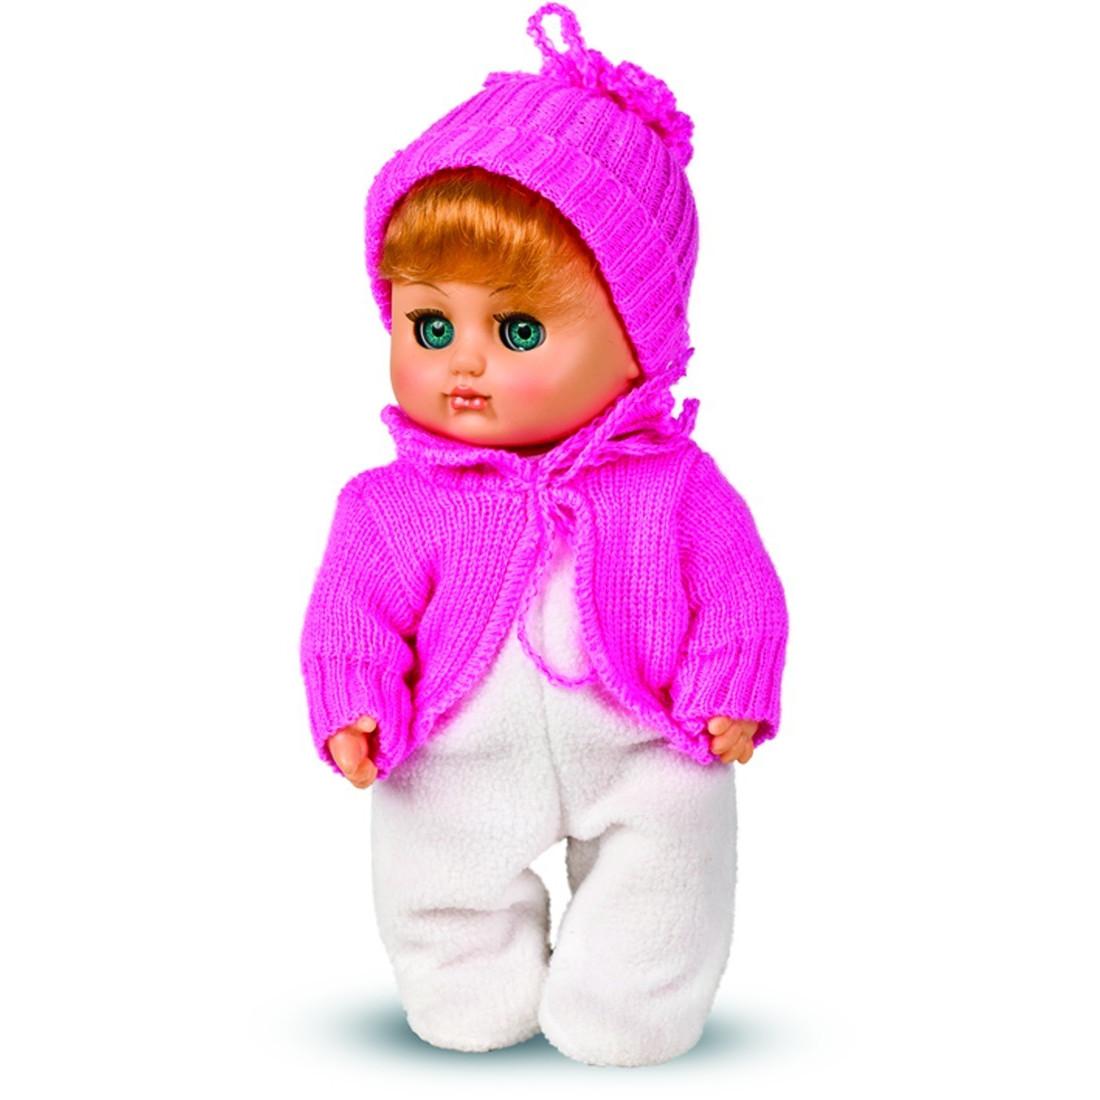 Кукла Любочка 7, 21 смРусские куклы фабрики Весна<br>Кукла Любочка 7, 21 см<br>